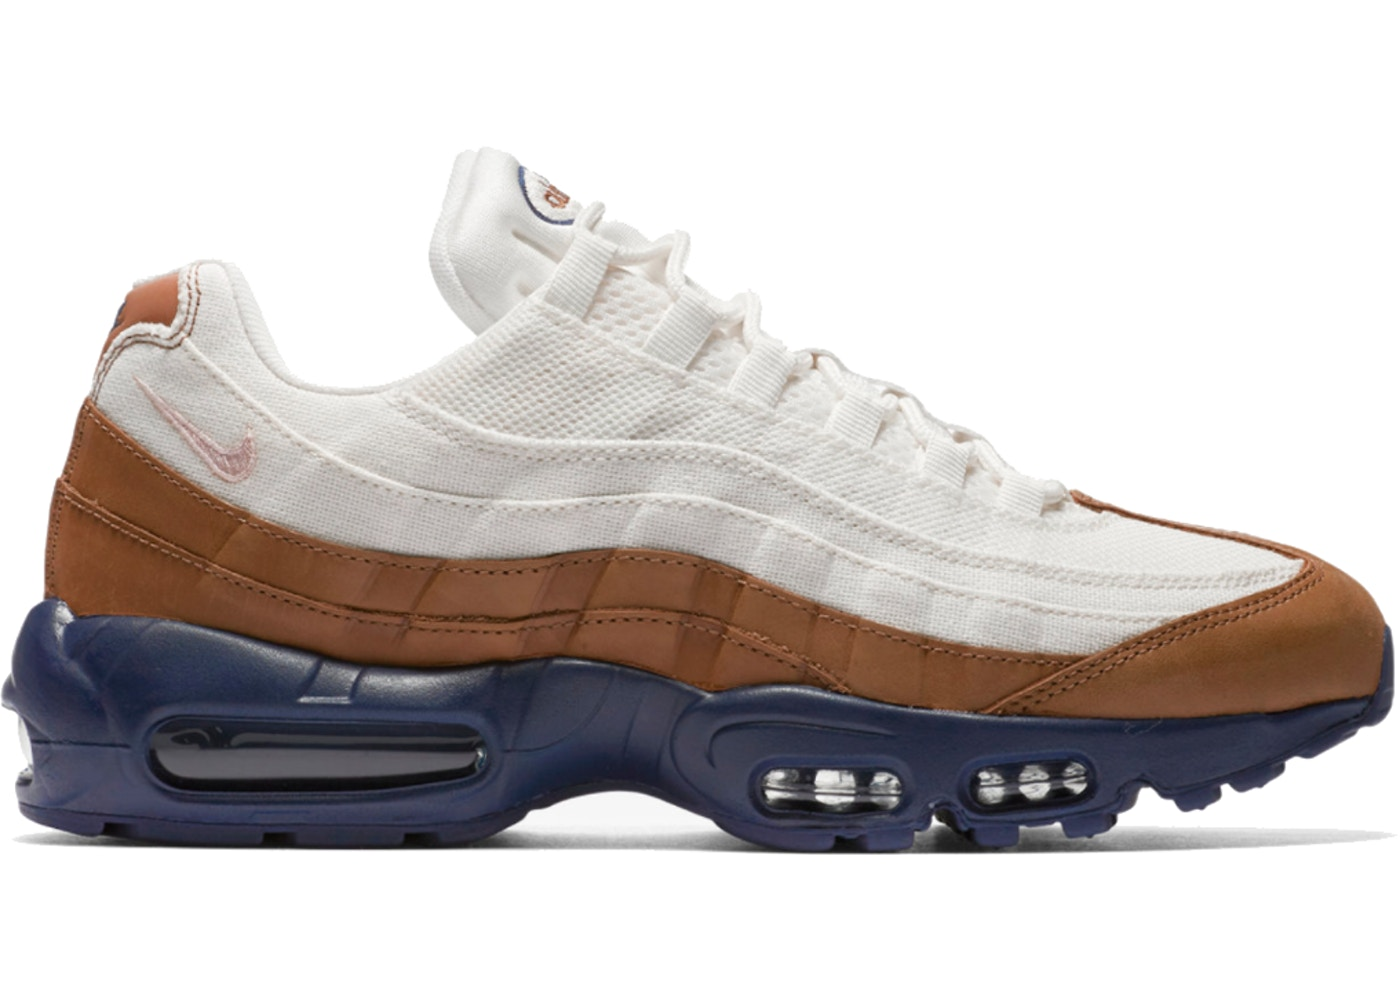 Nike Air Max 95 Ale Brown